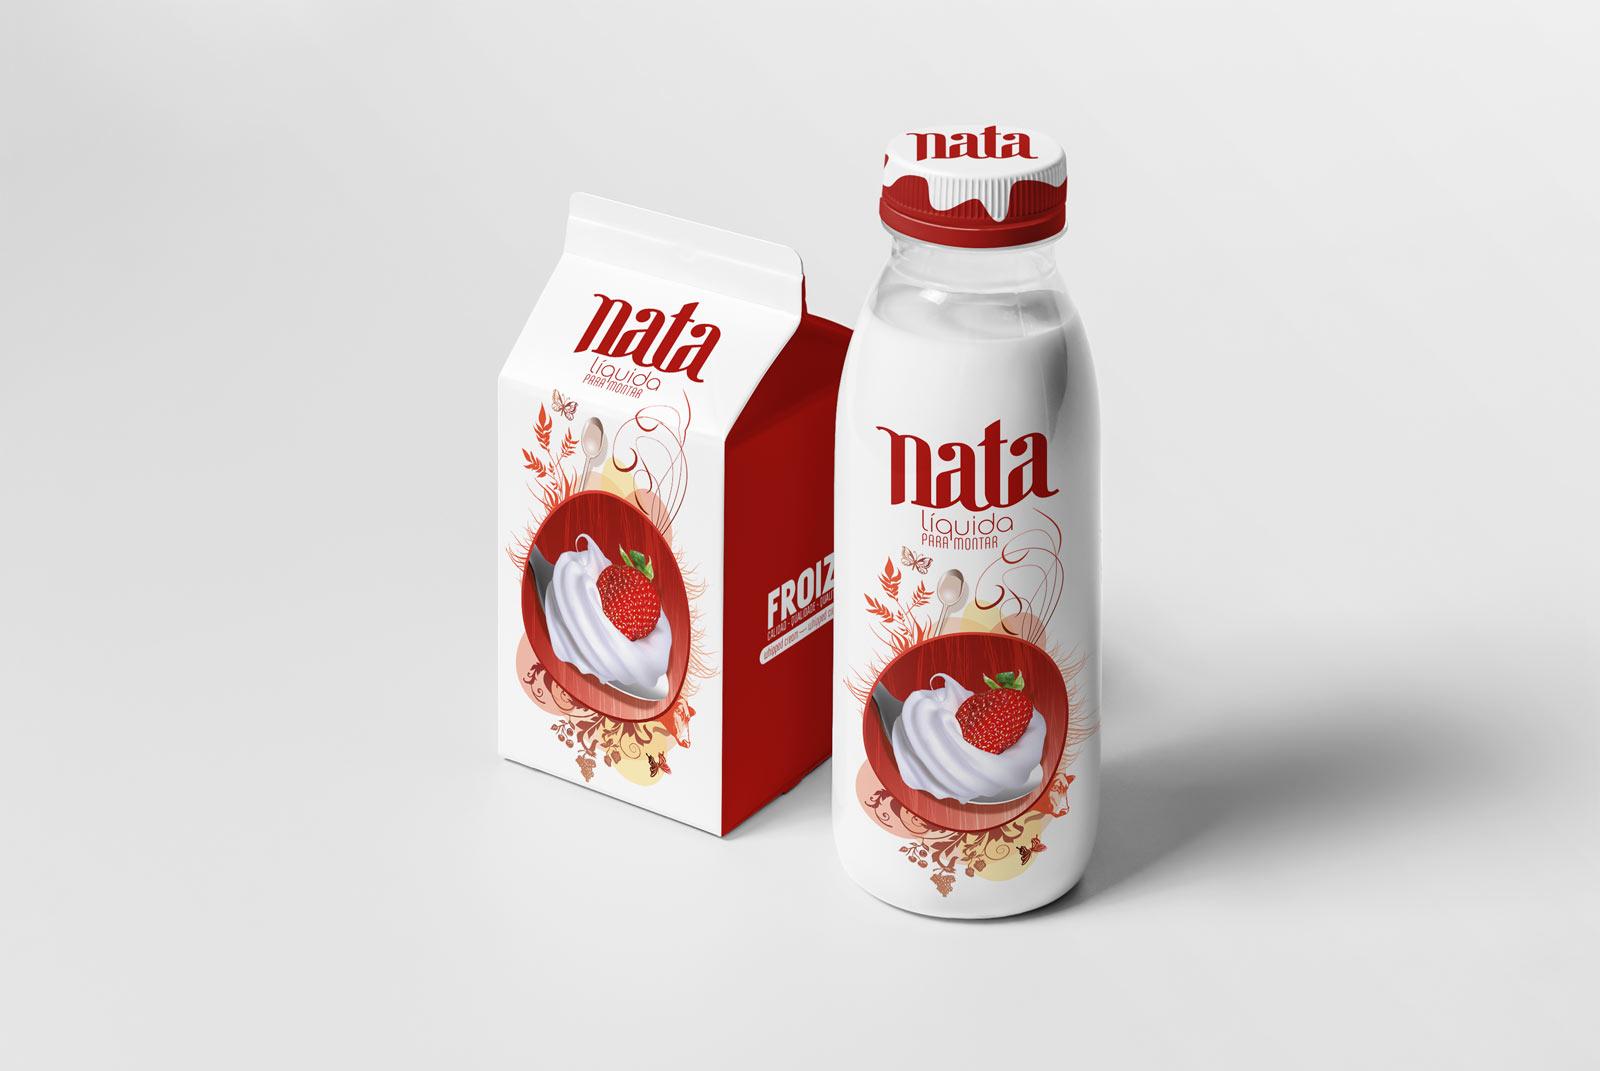 Froiz-nata-packaging-04